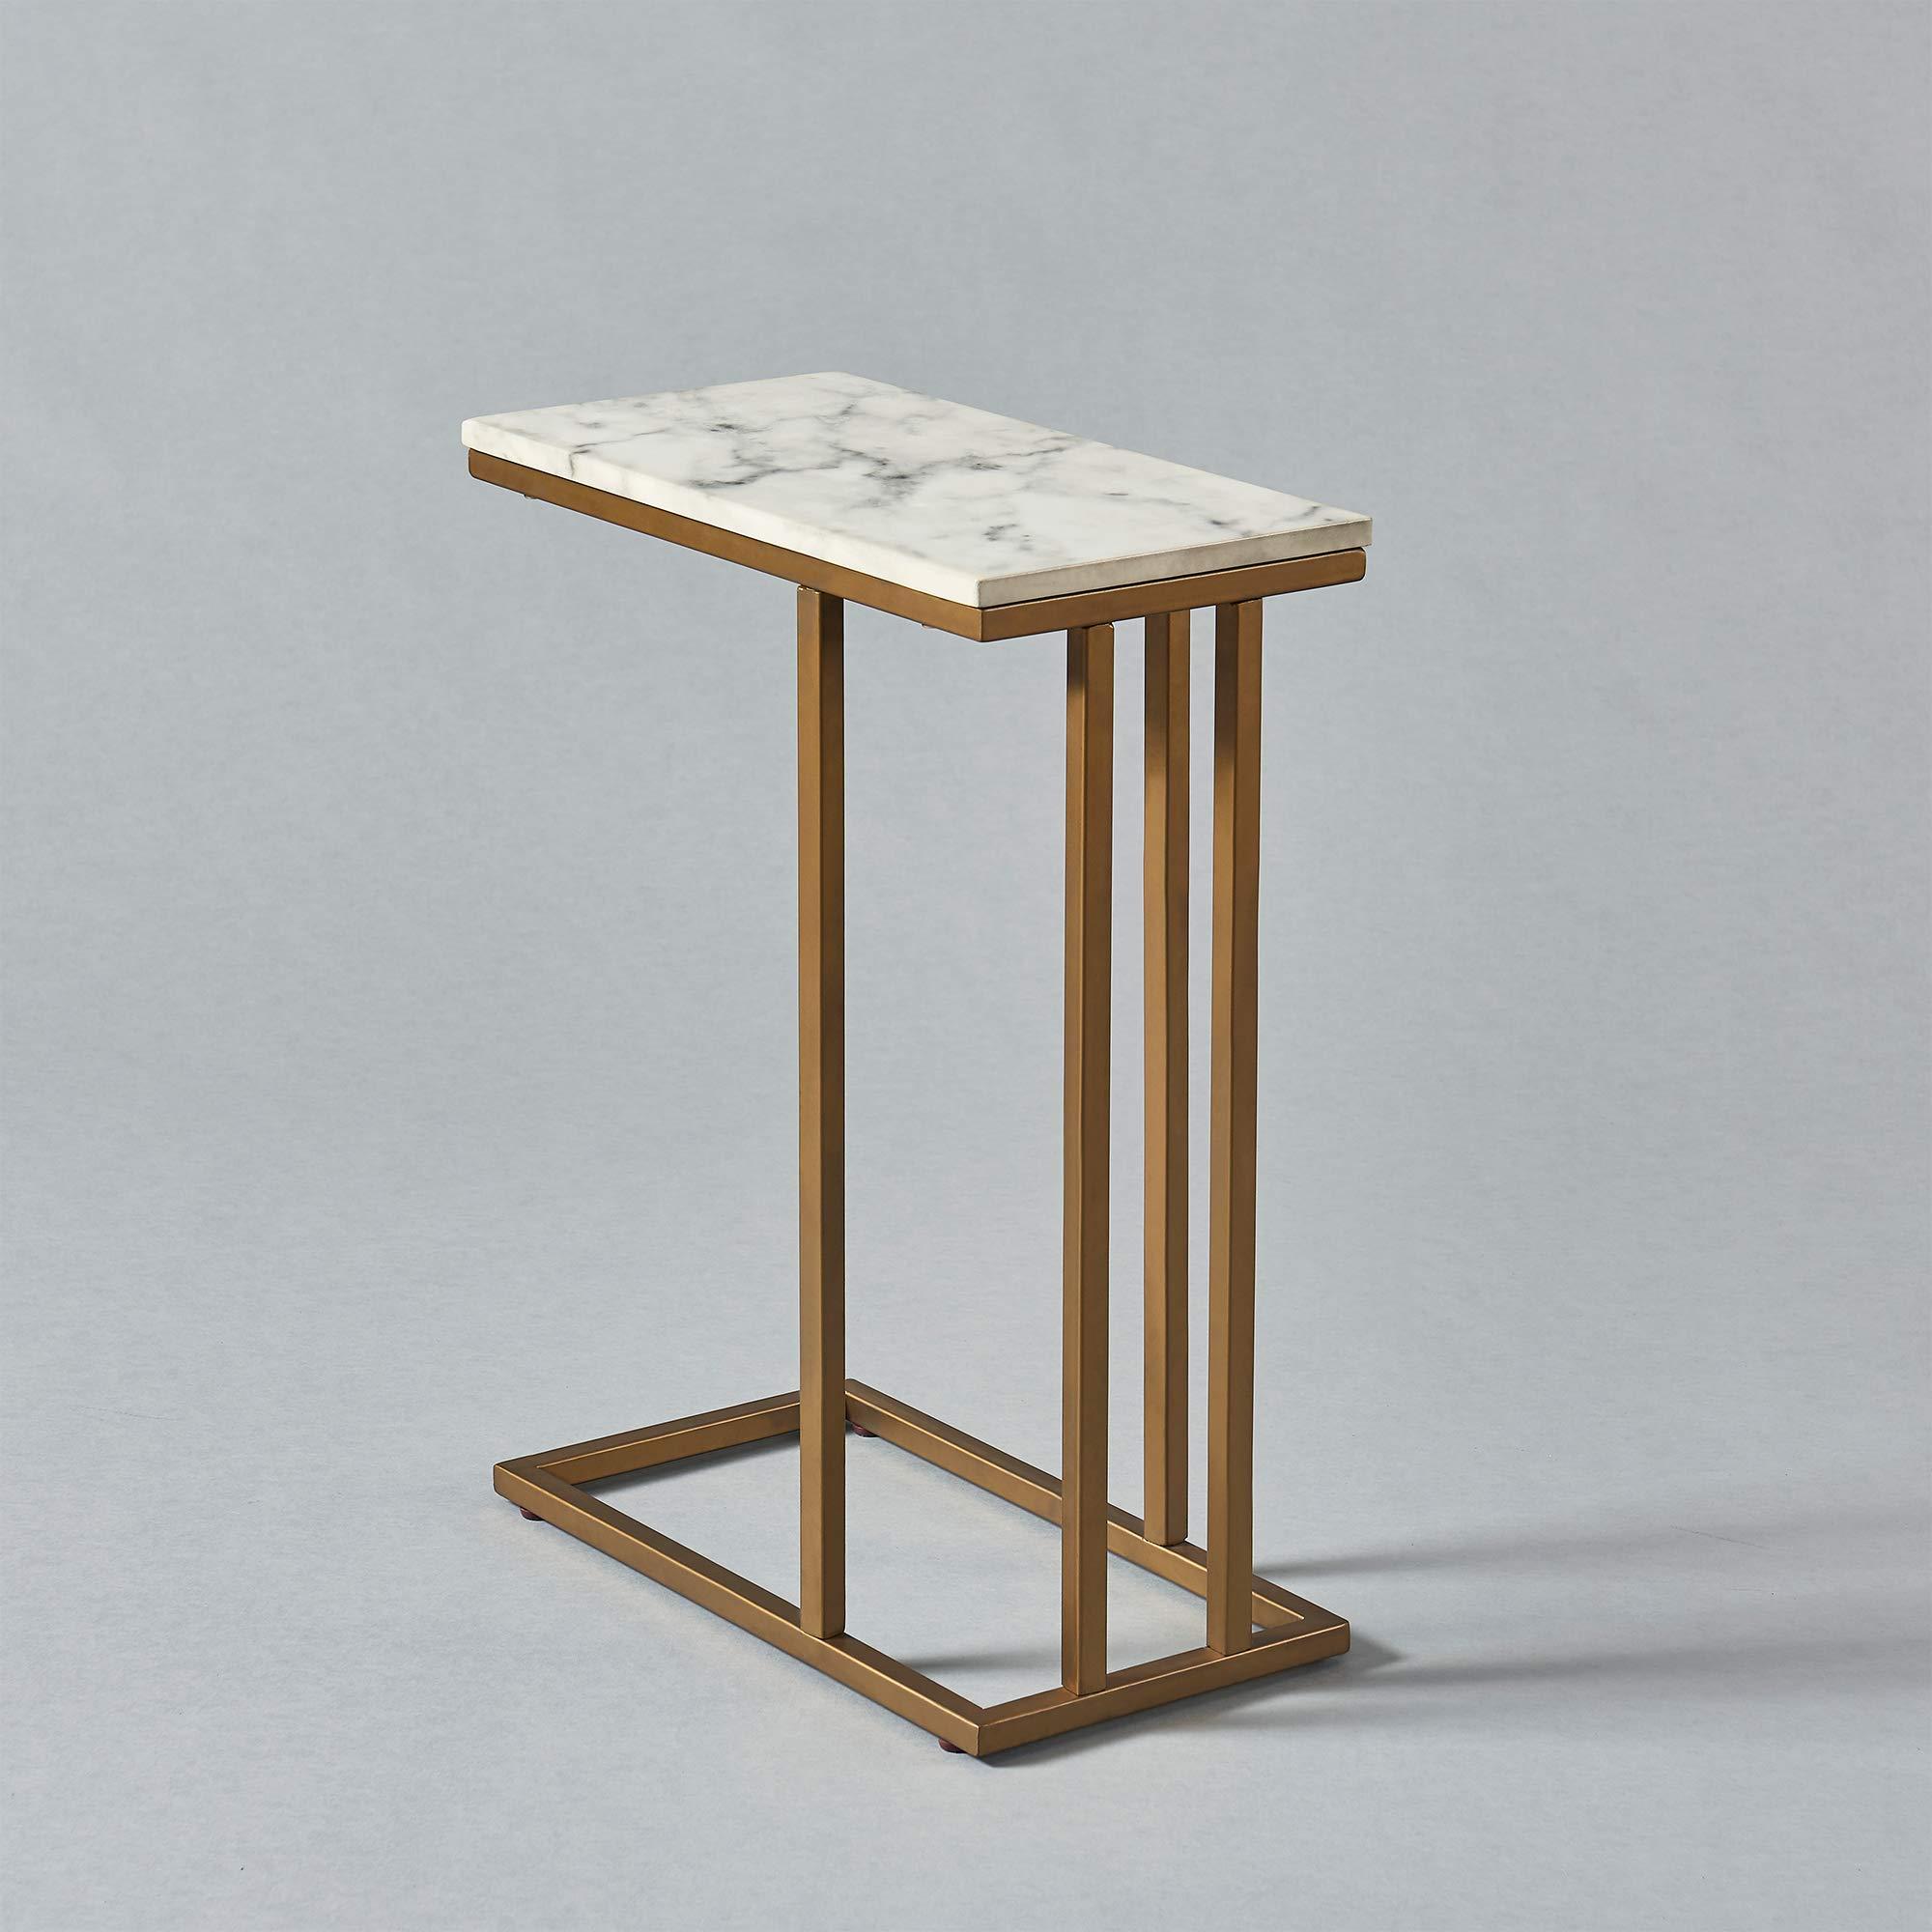 Versanora - Marmo C Shape Table - Faux Marble /Brass by Versanora (Image #15)